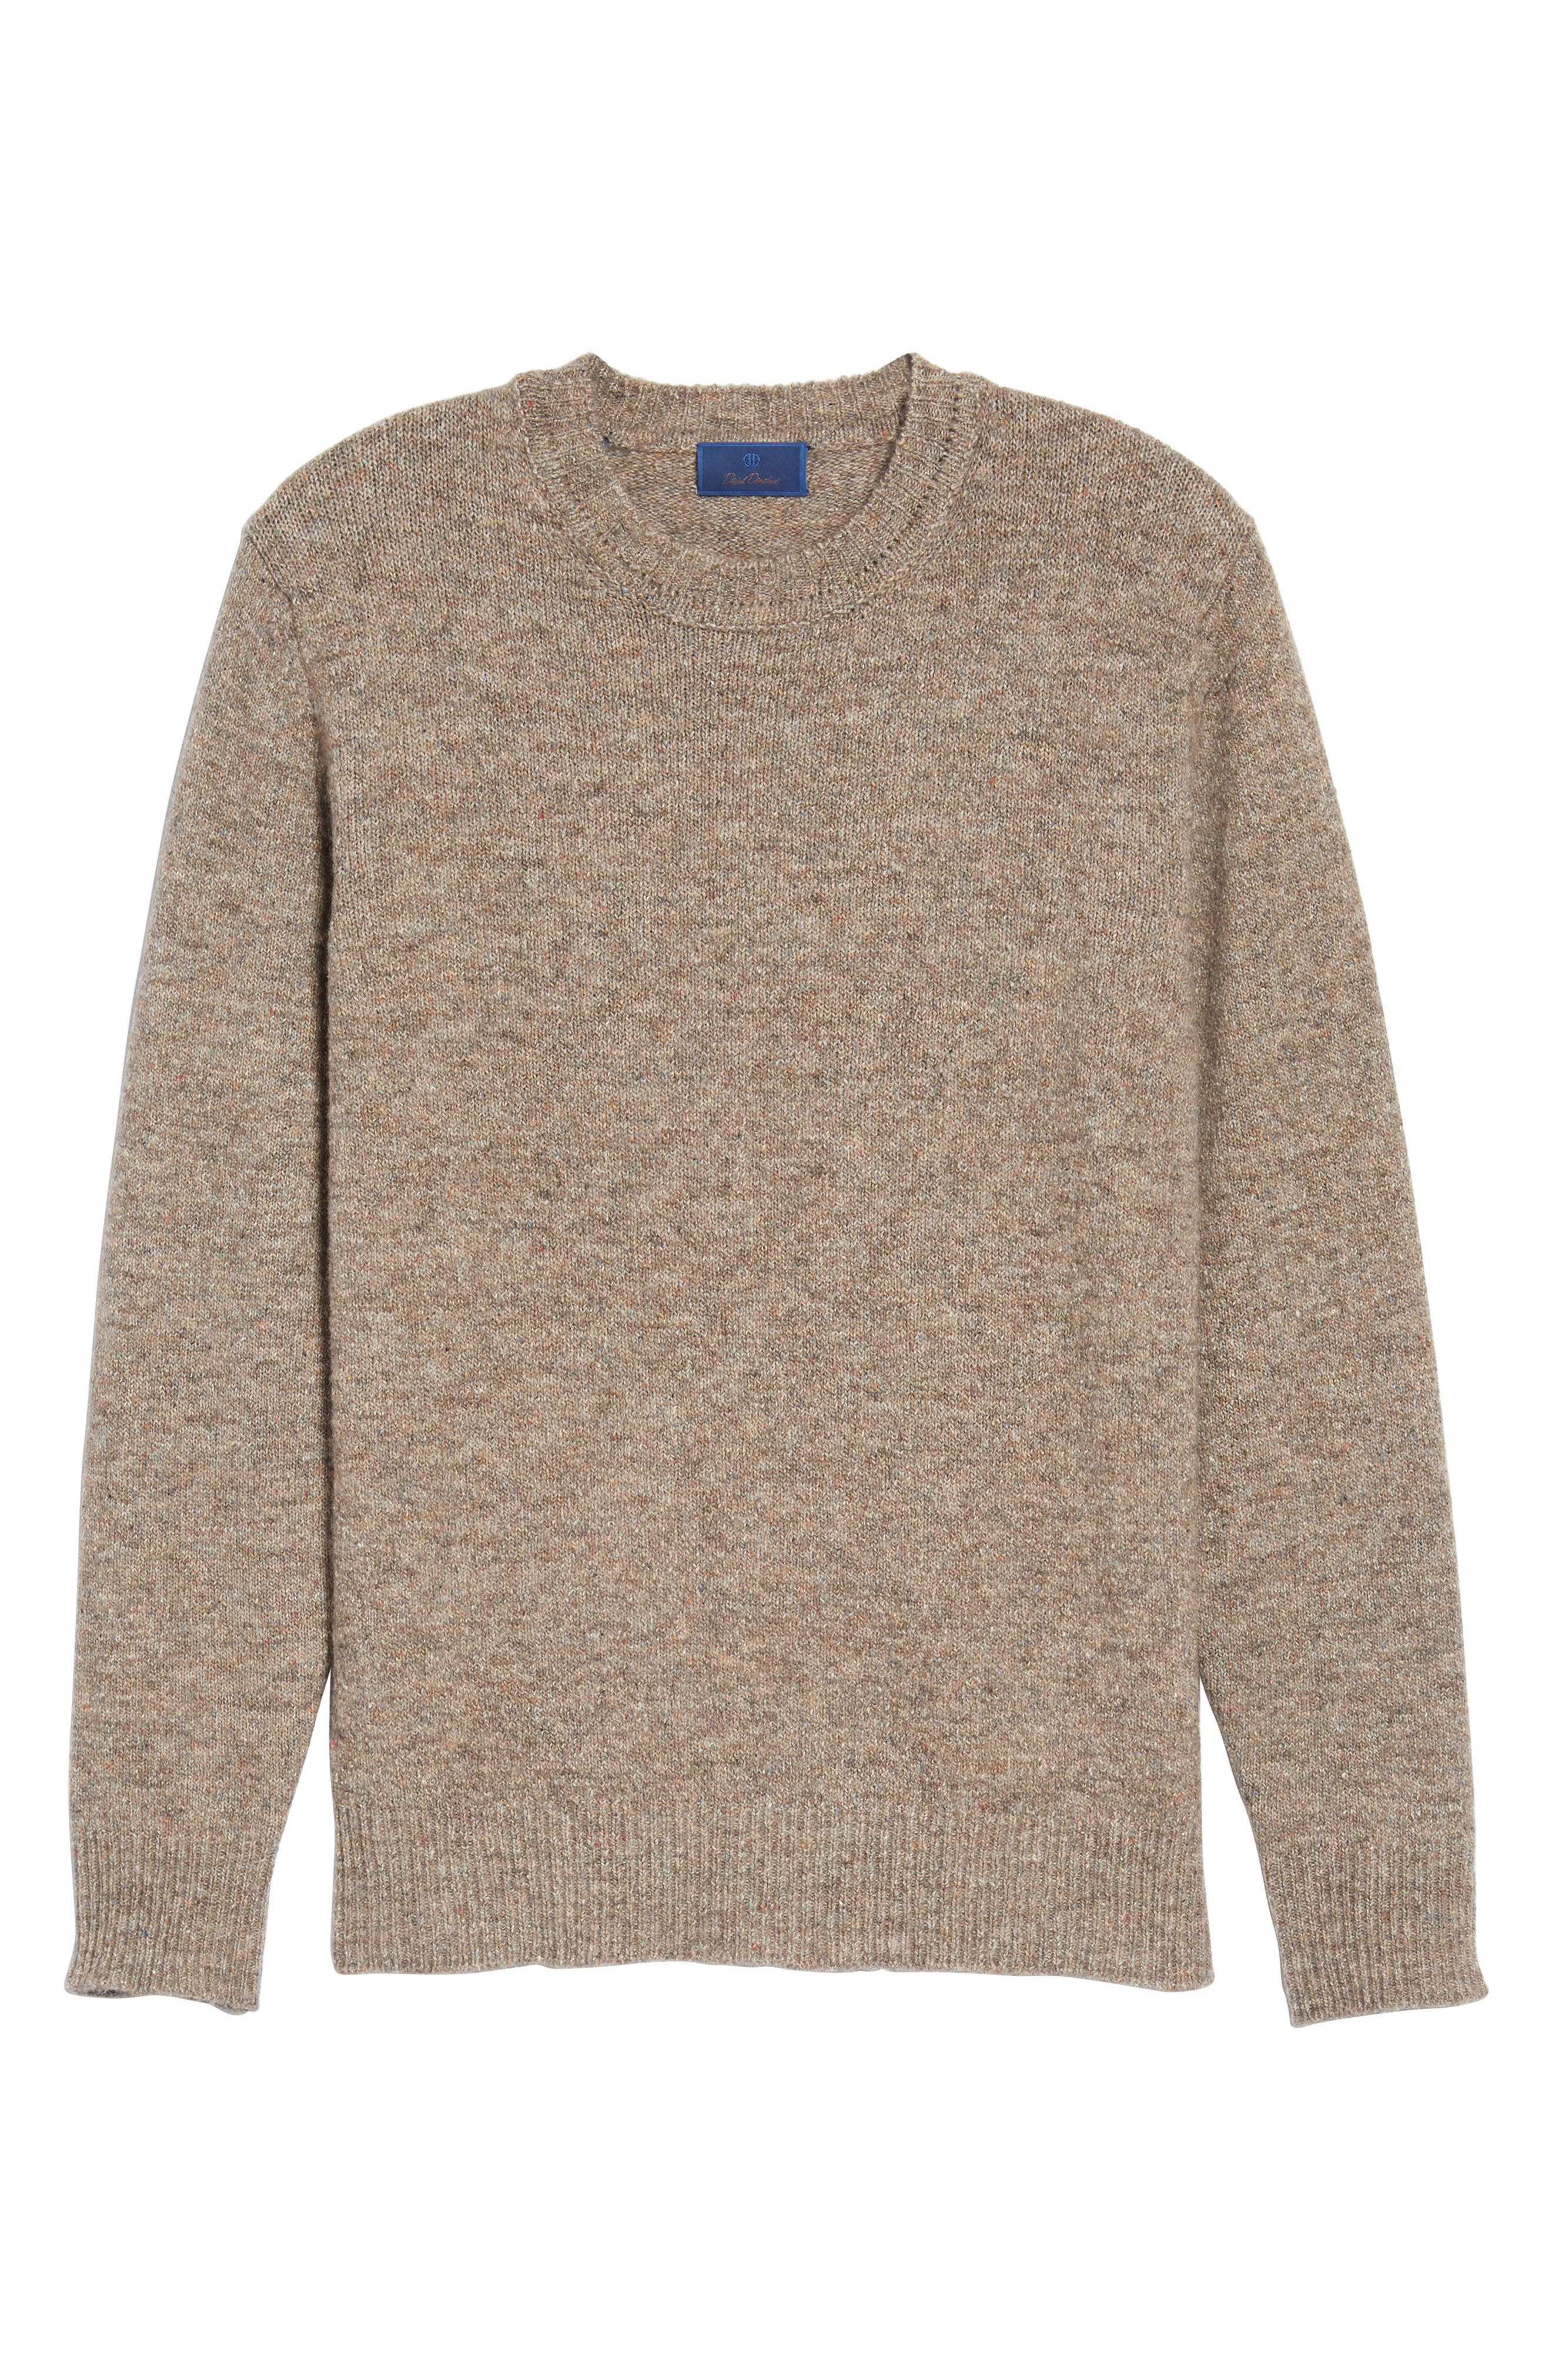 Tweed Crewneck Sweater,                             Alternate thumbnail 6, color,                             Sand